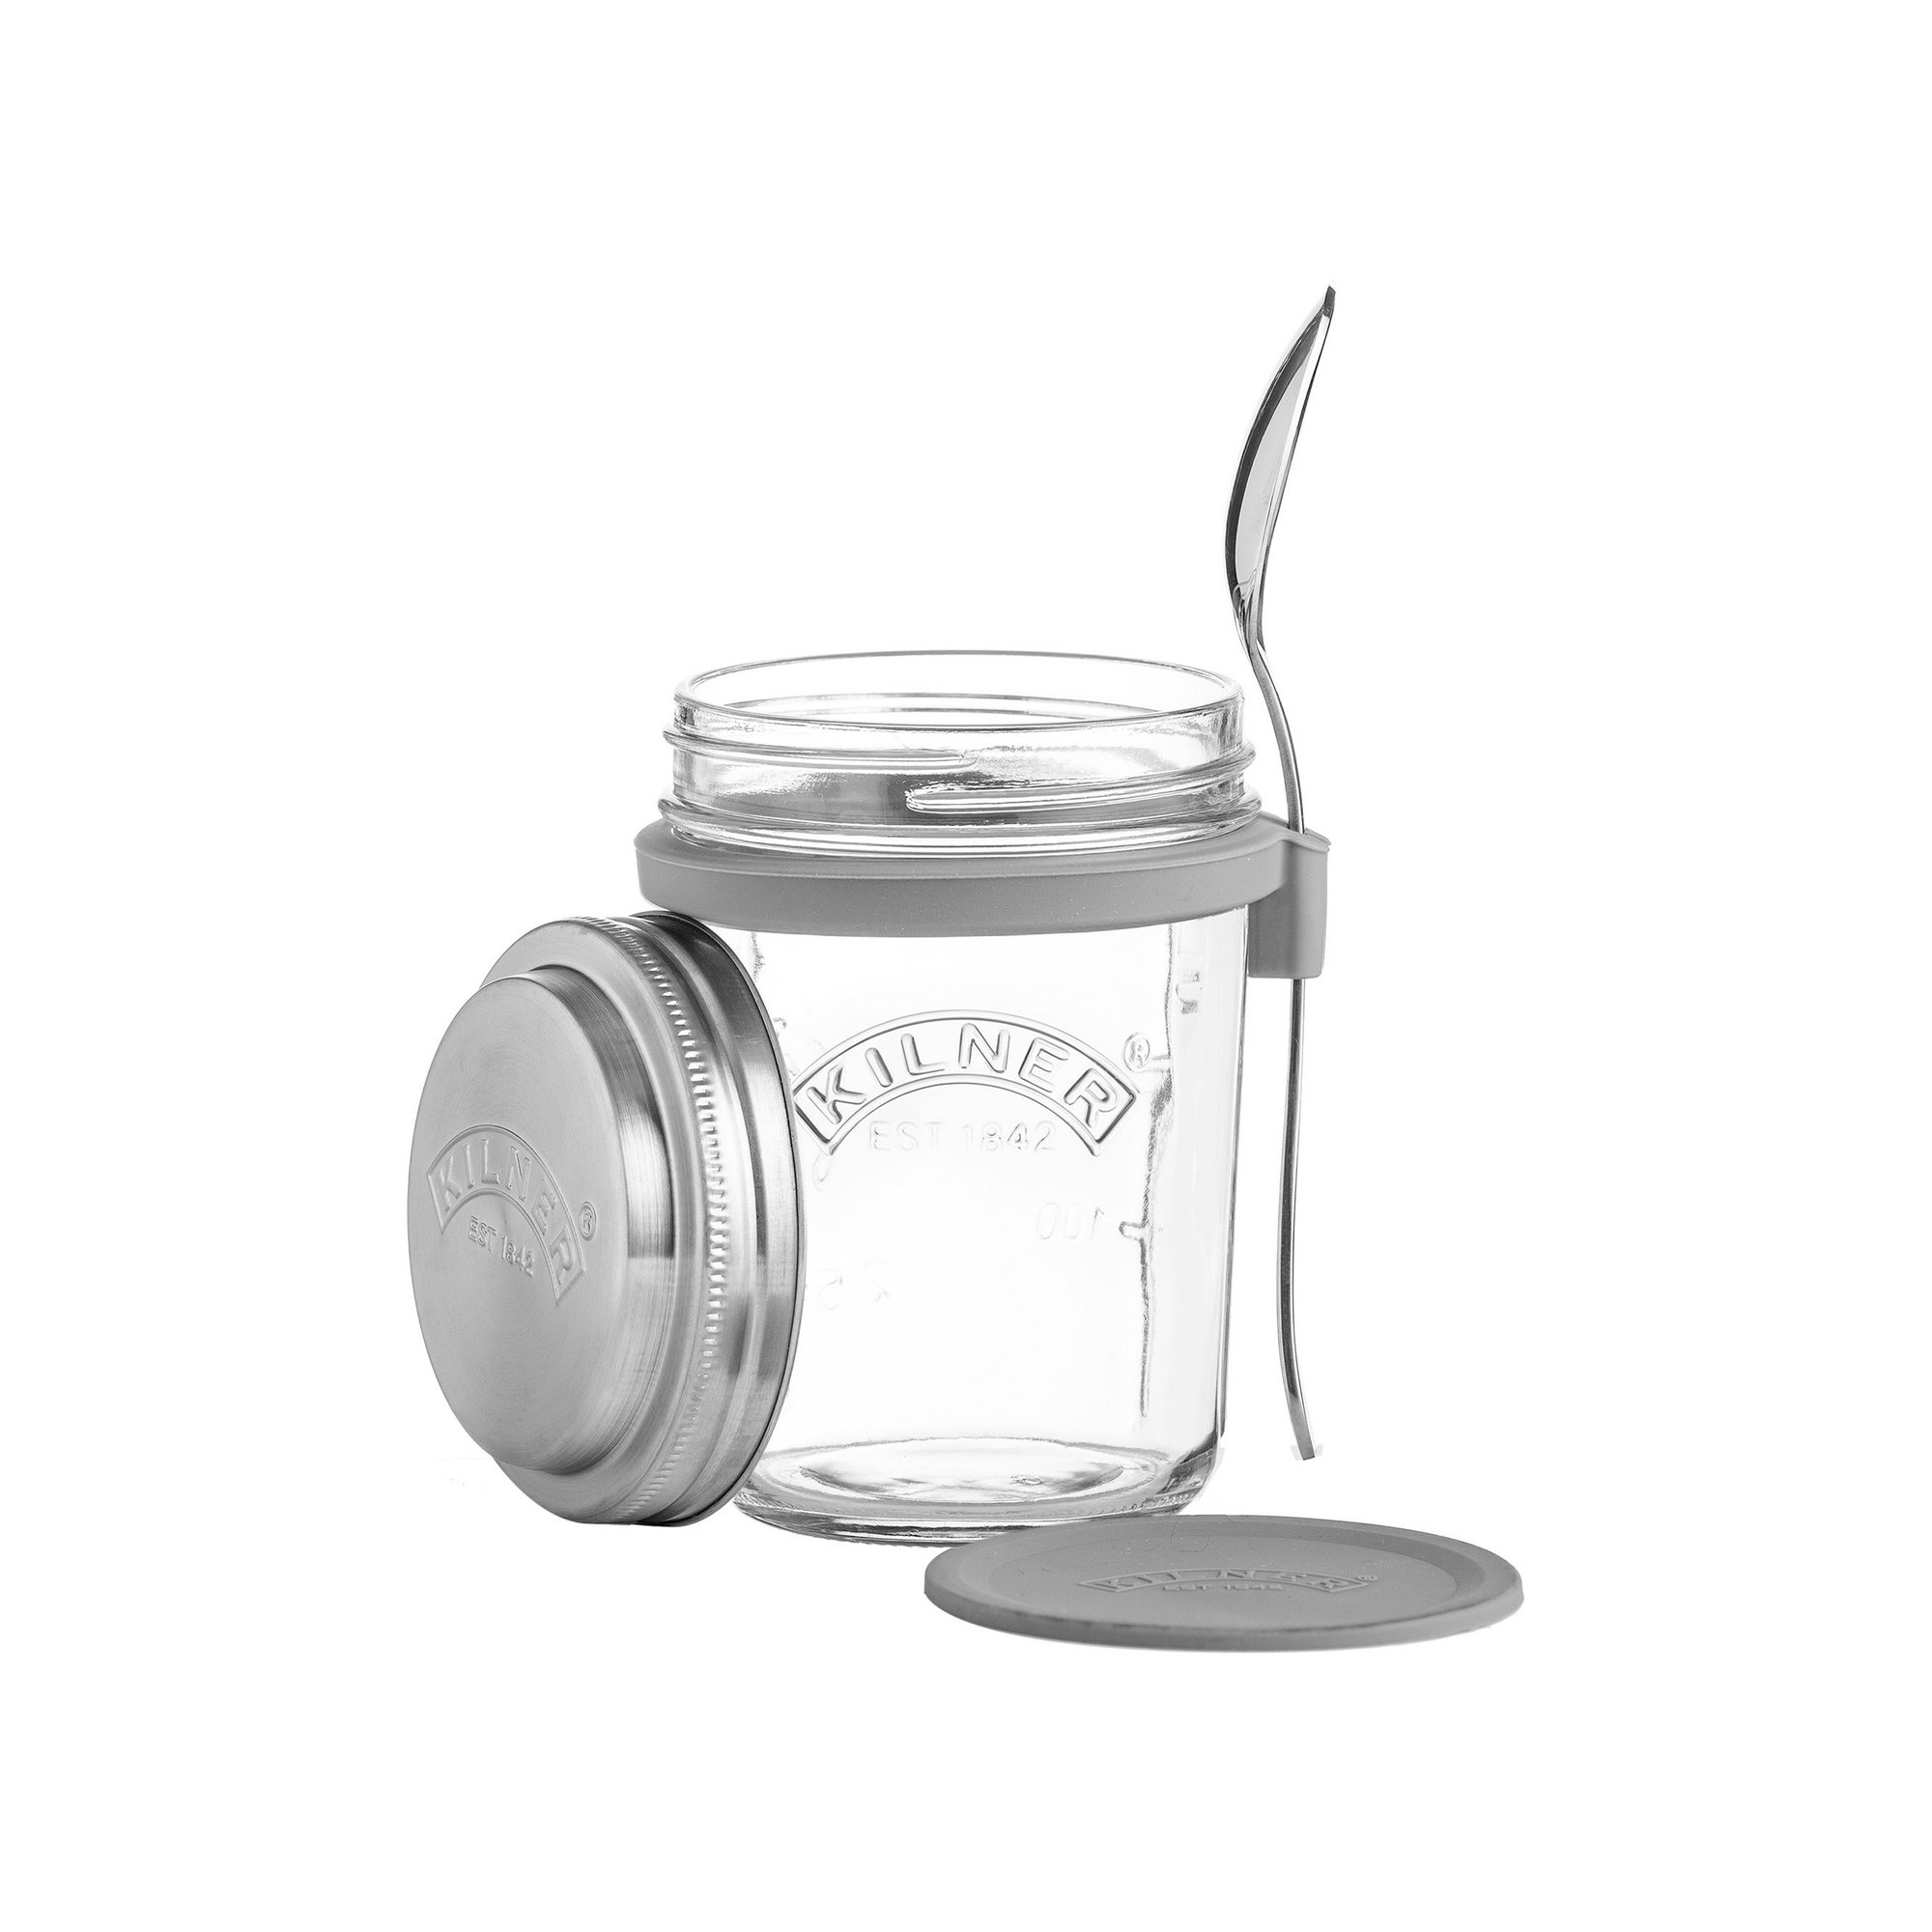 Image of Kilner Breakfast Jar Set